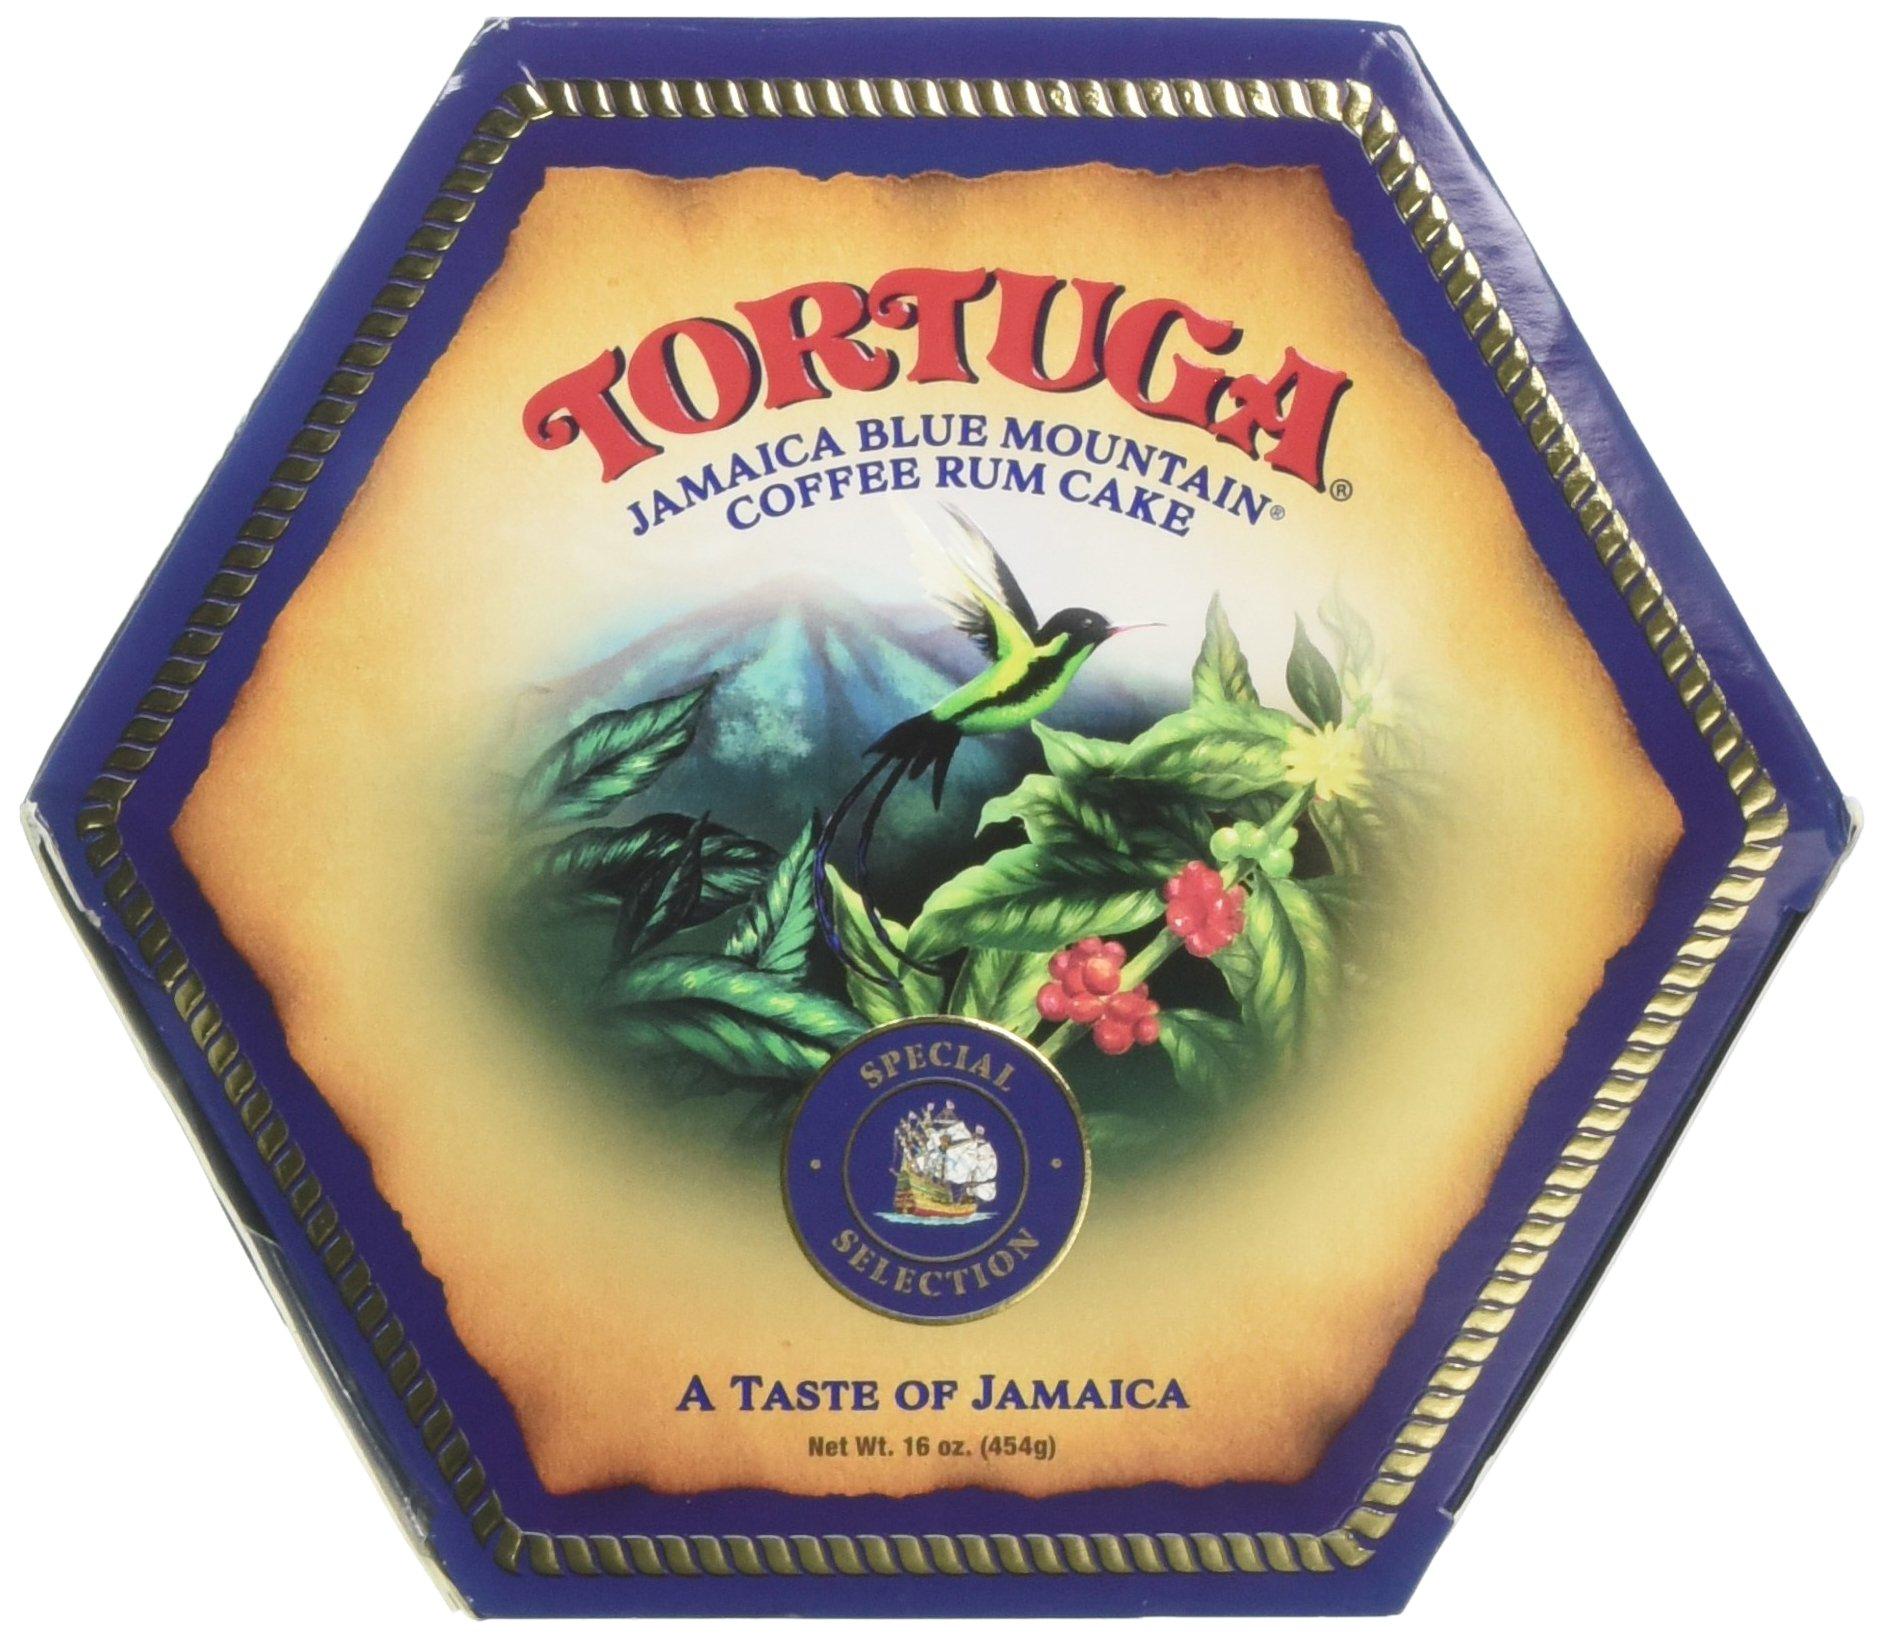 TORTUGA Caribbean Blue Mountain Rum Cake - 16 oz. - The Perfect Premium Gourmet Gift by TORTUGA (Image #1)